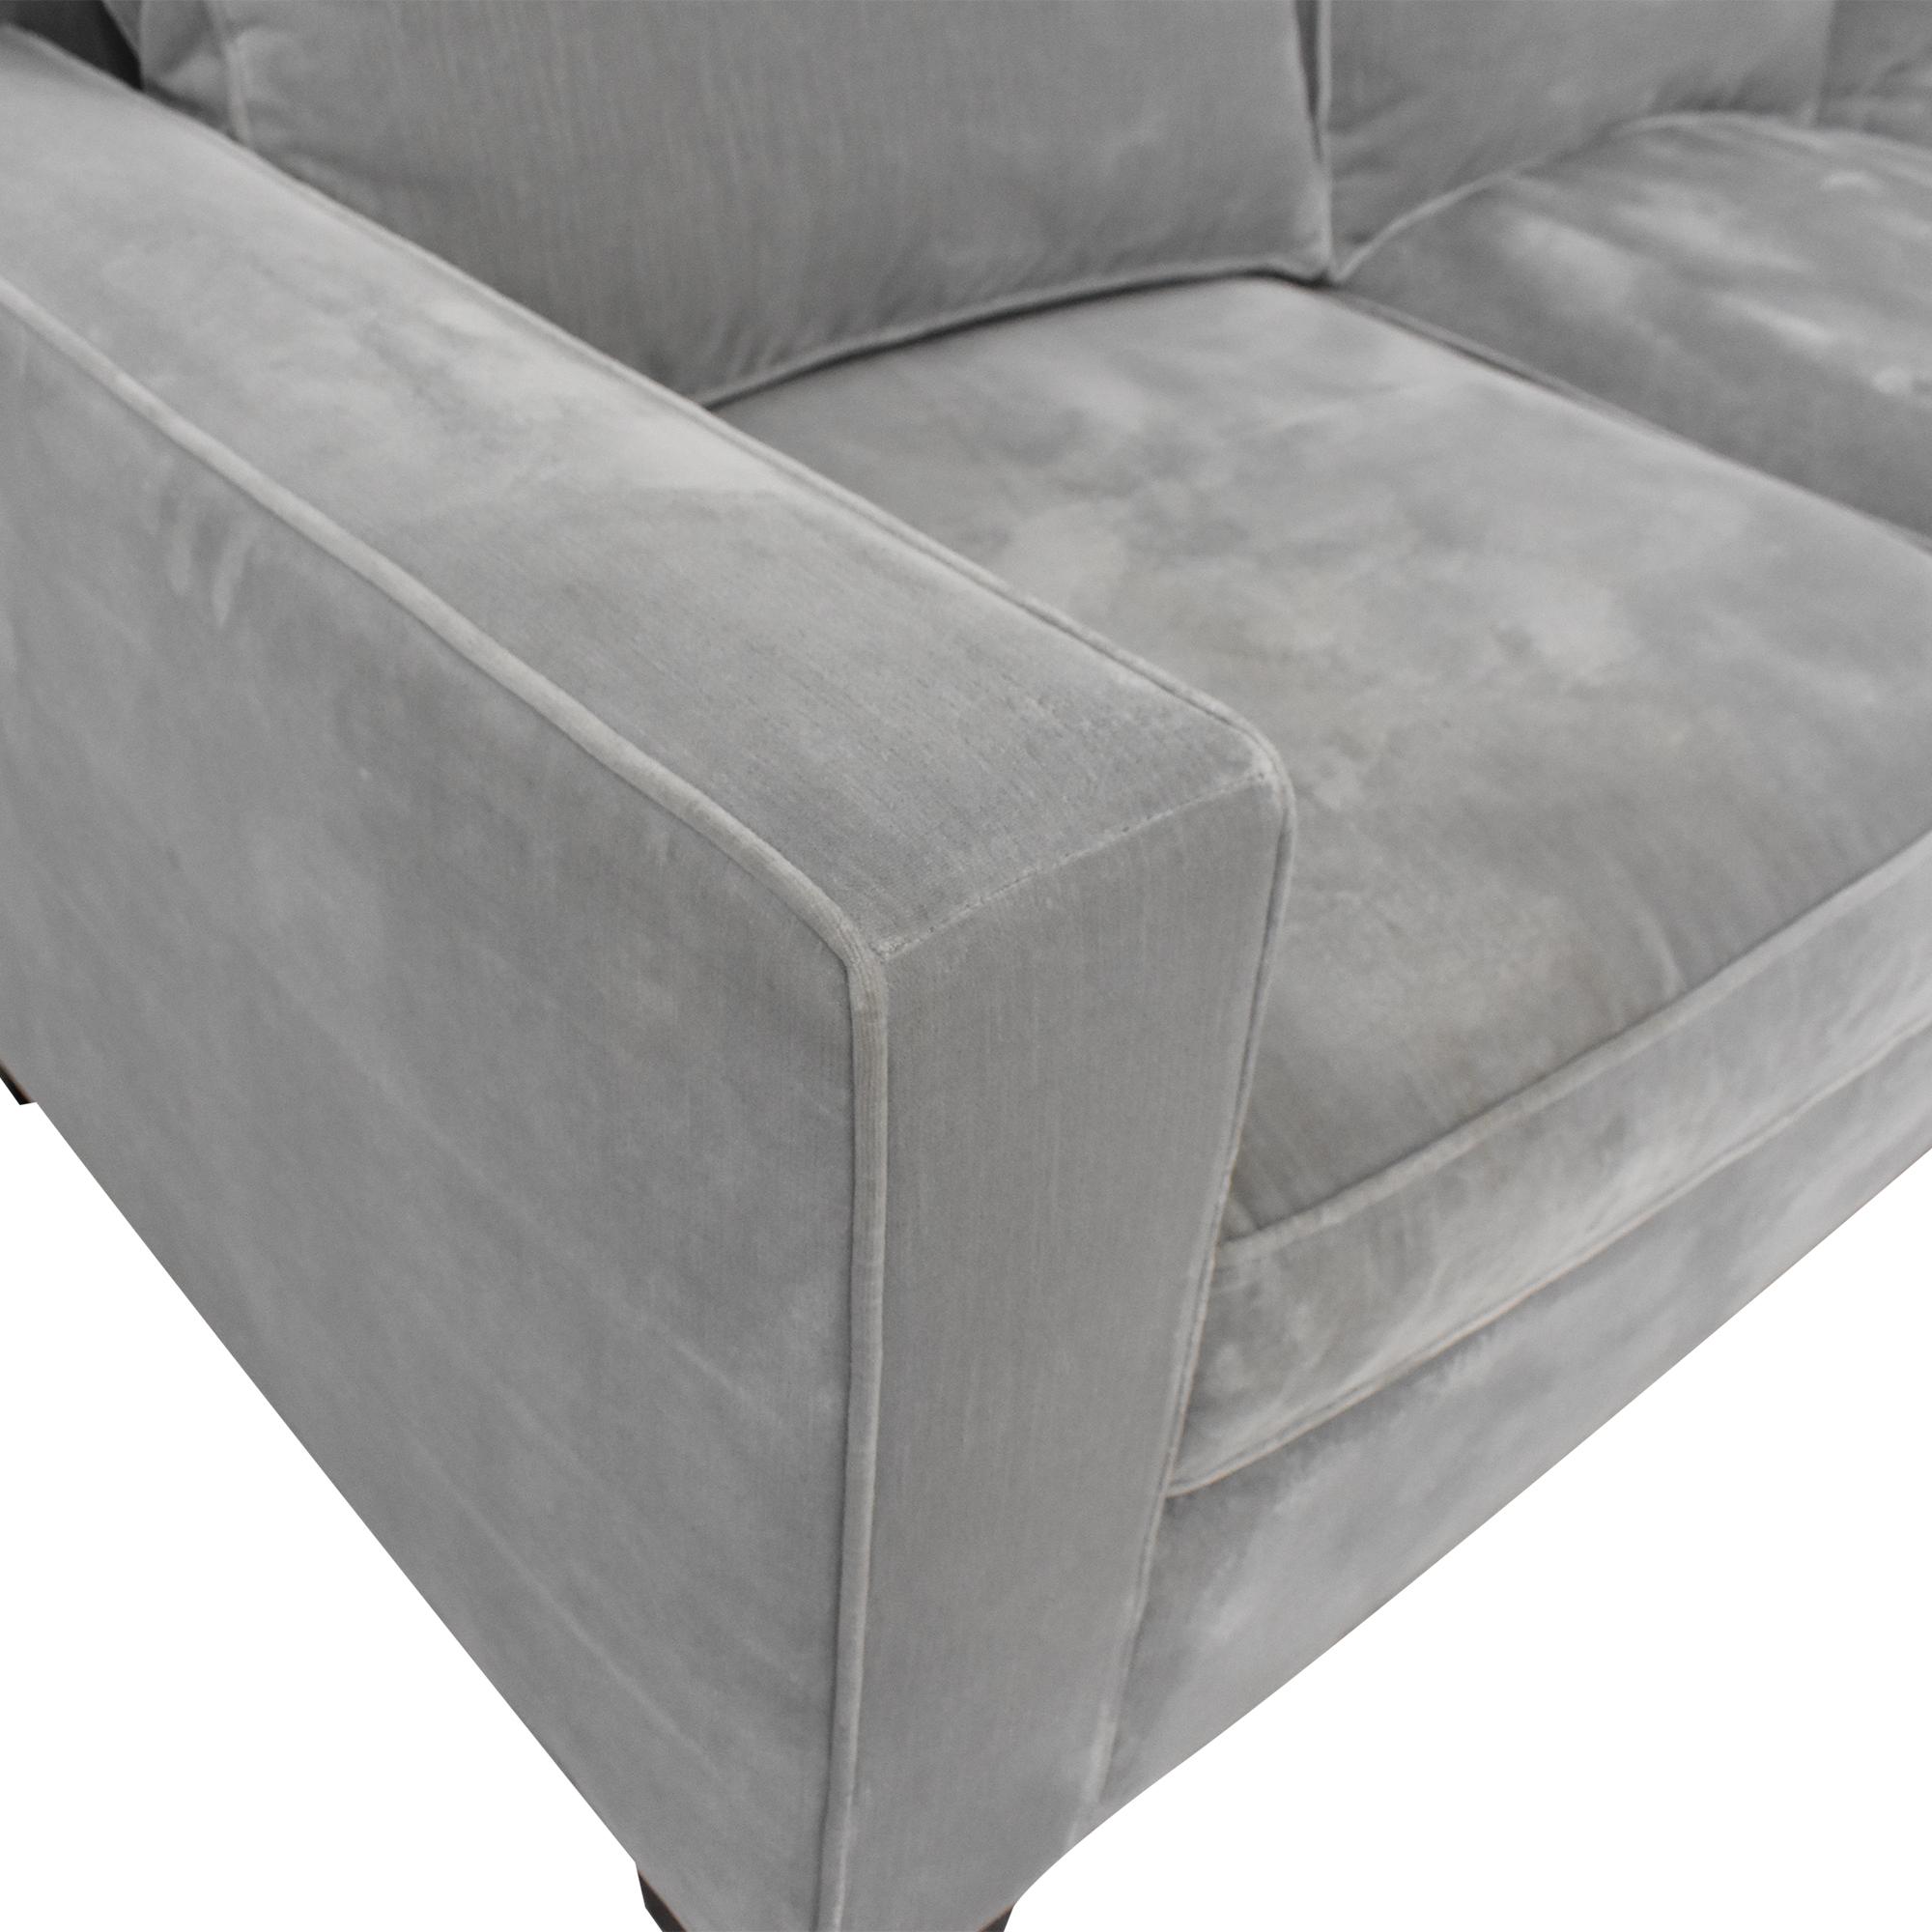 Ralph Lauren Home Ralph Lauren Home Three Cushion Sofa Grey